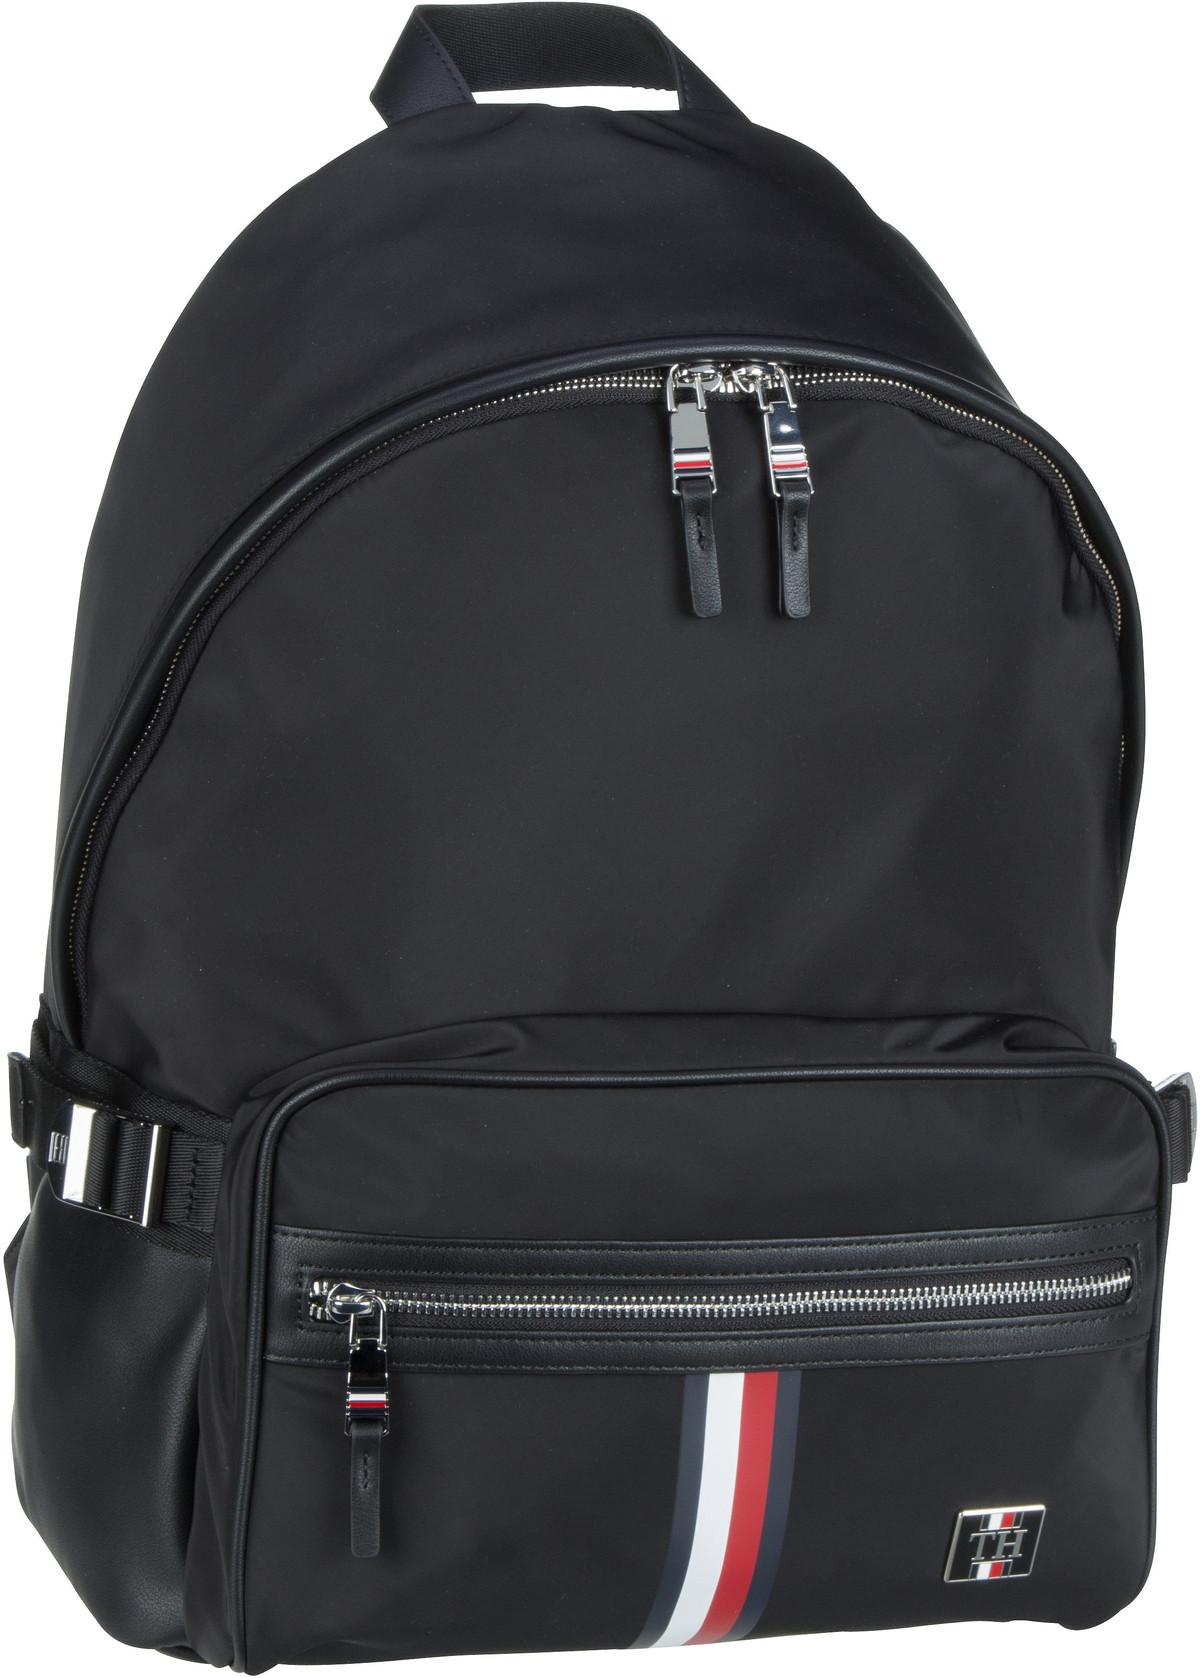 Rucksack / Daypack Clean Nylon Backpack SP20 Black